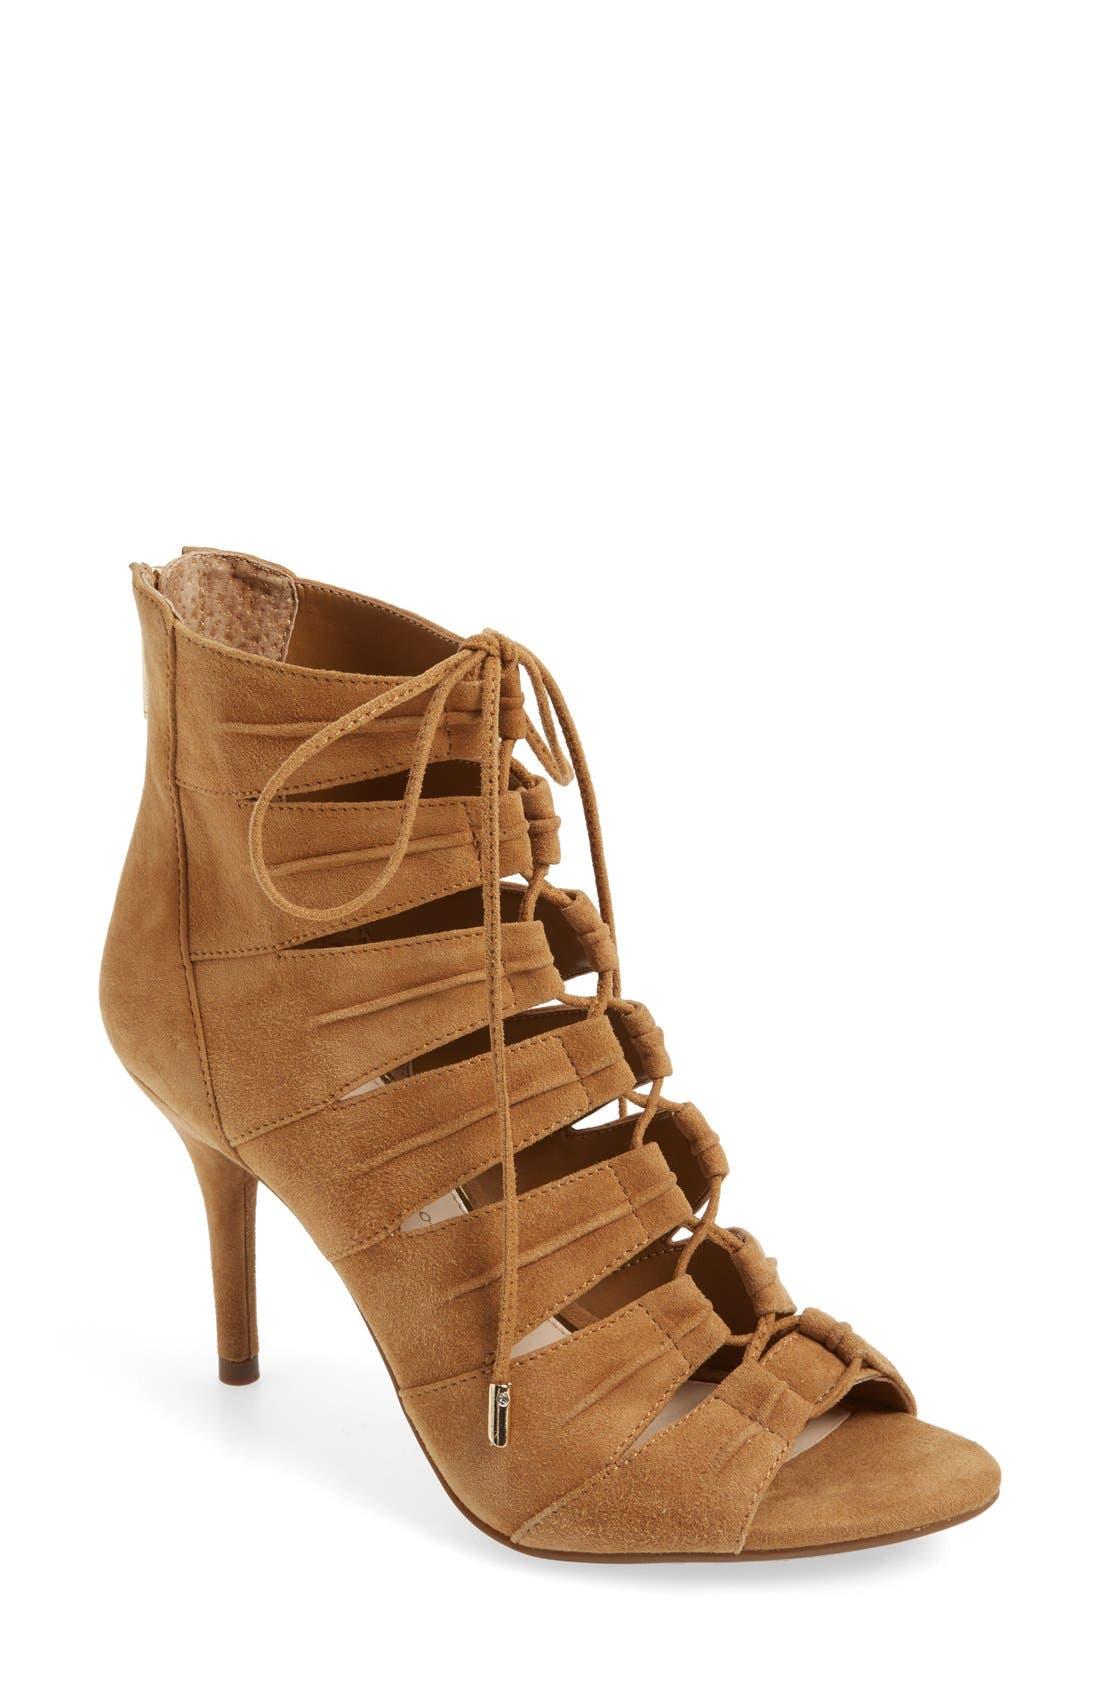 Alternate Image 1 Selected - Jessica Simpson 'Mahiri' Ghillie Open Toe Bootie (Women)